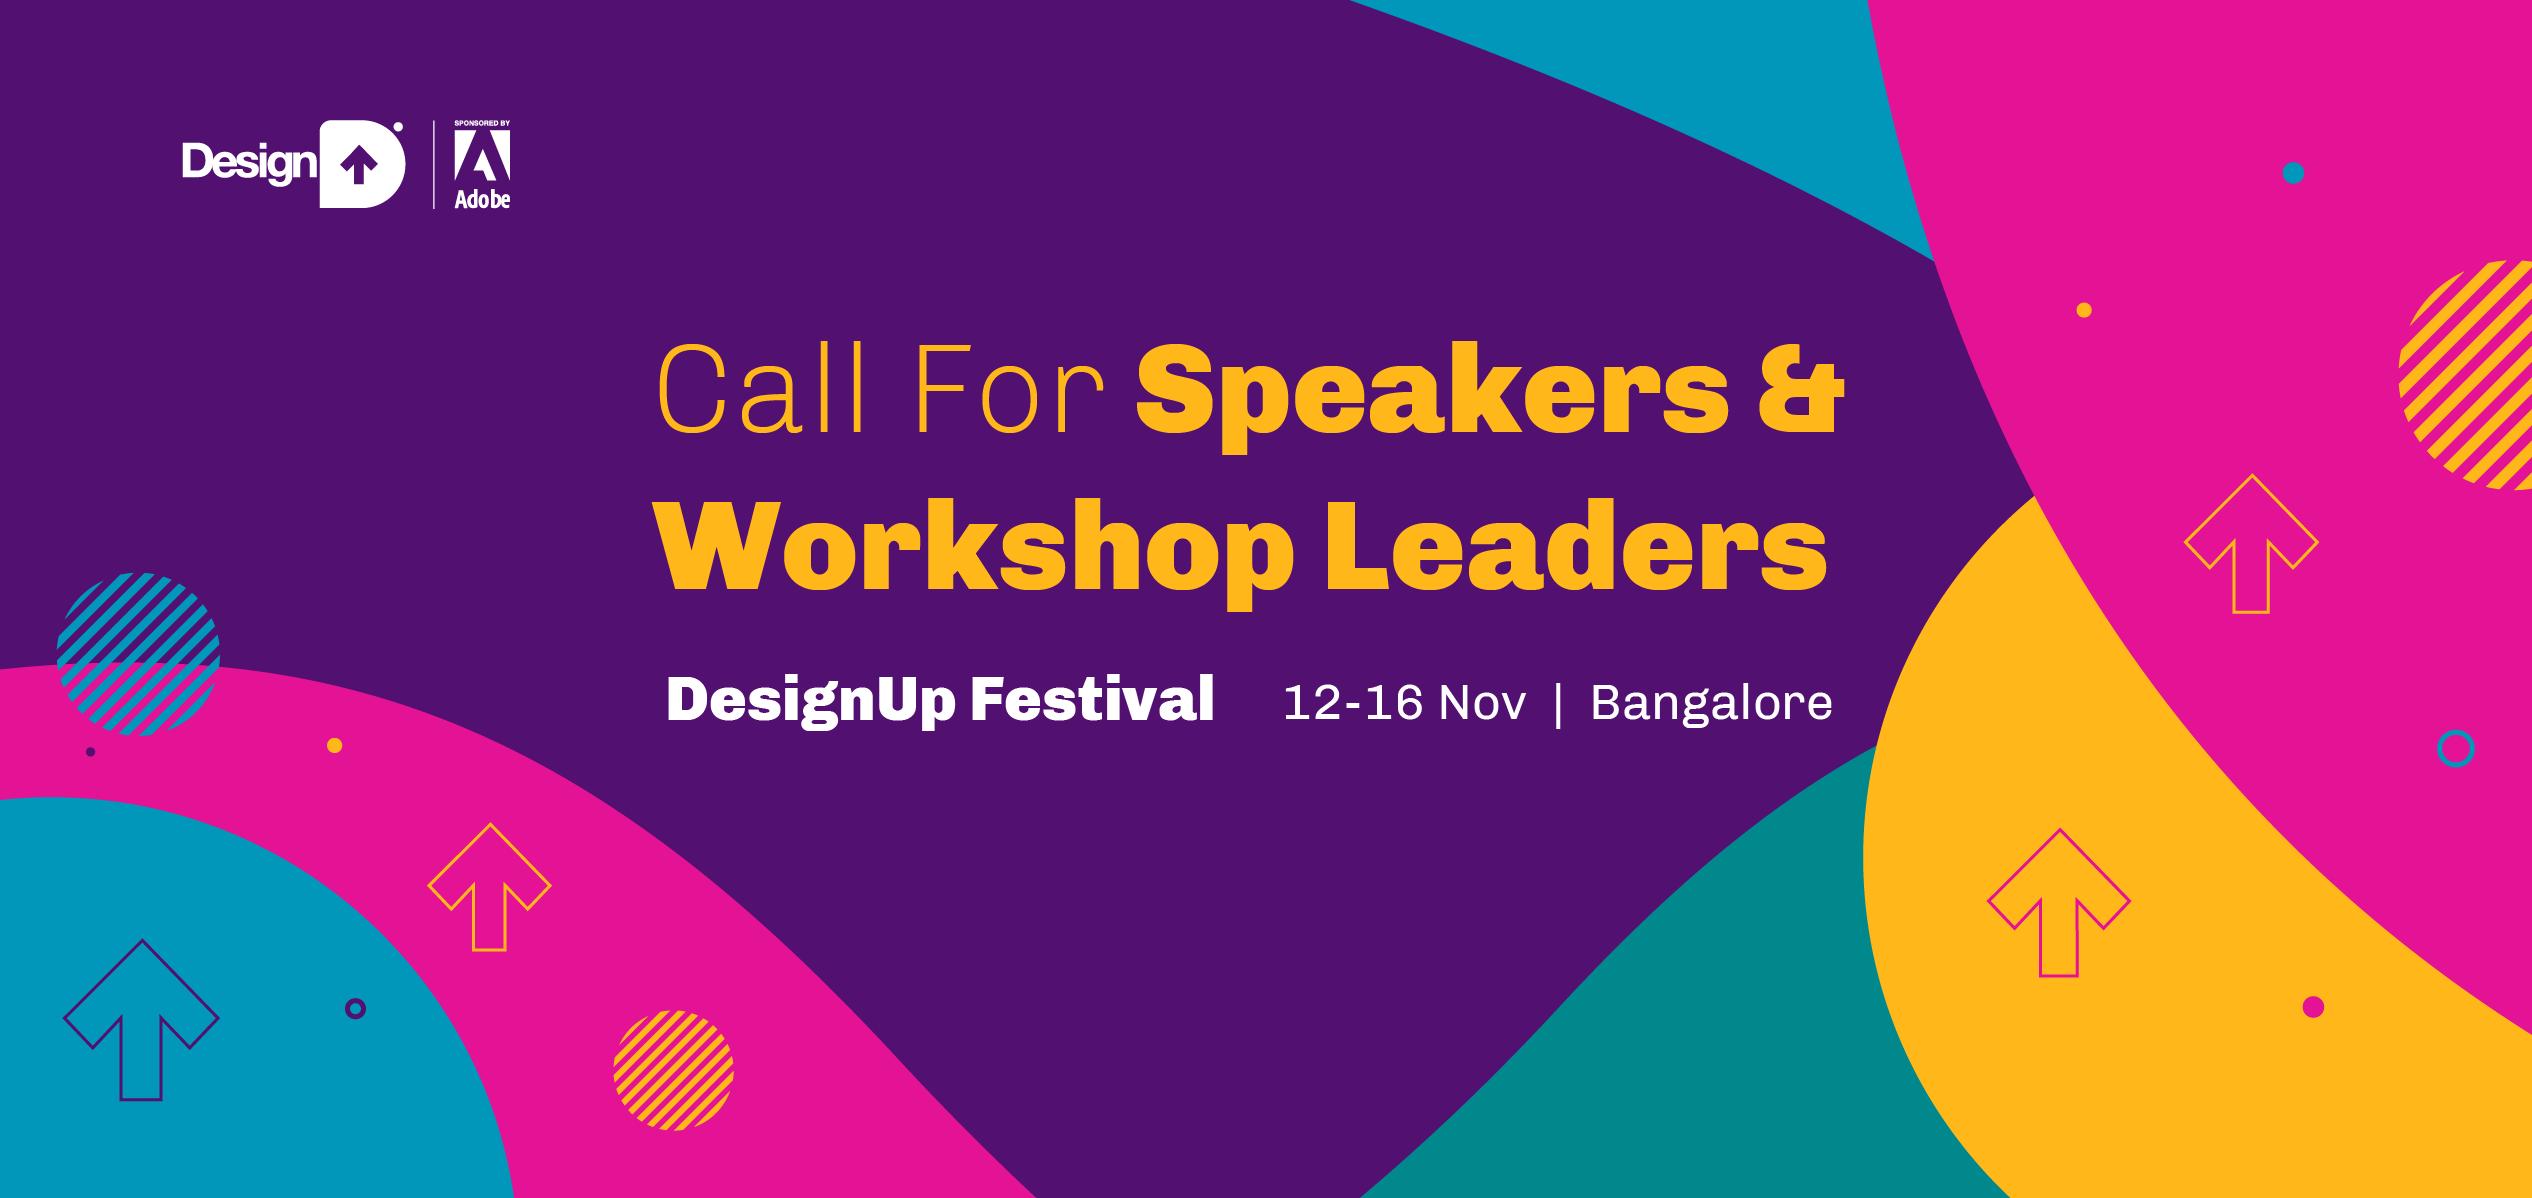 Call for Speakers, Workshop leaders - DesignUp | Home